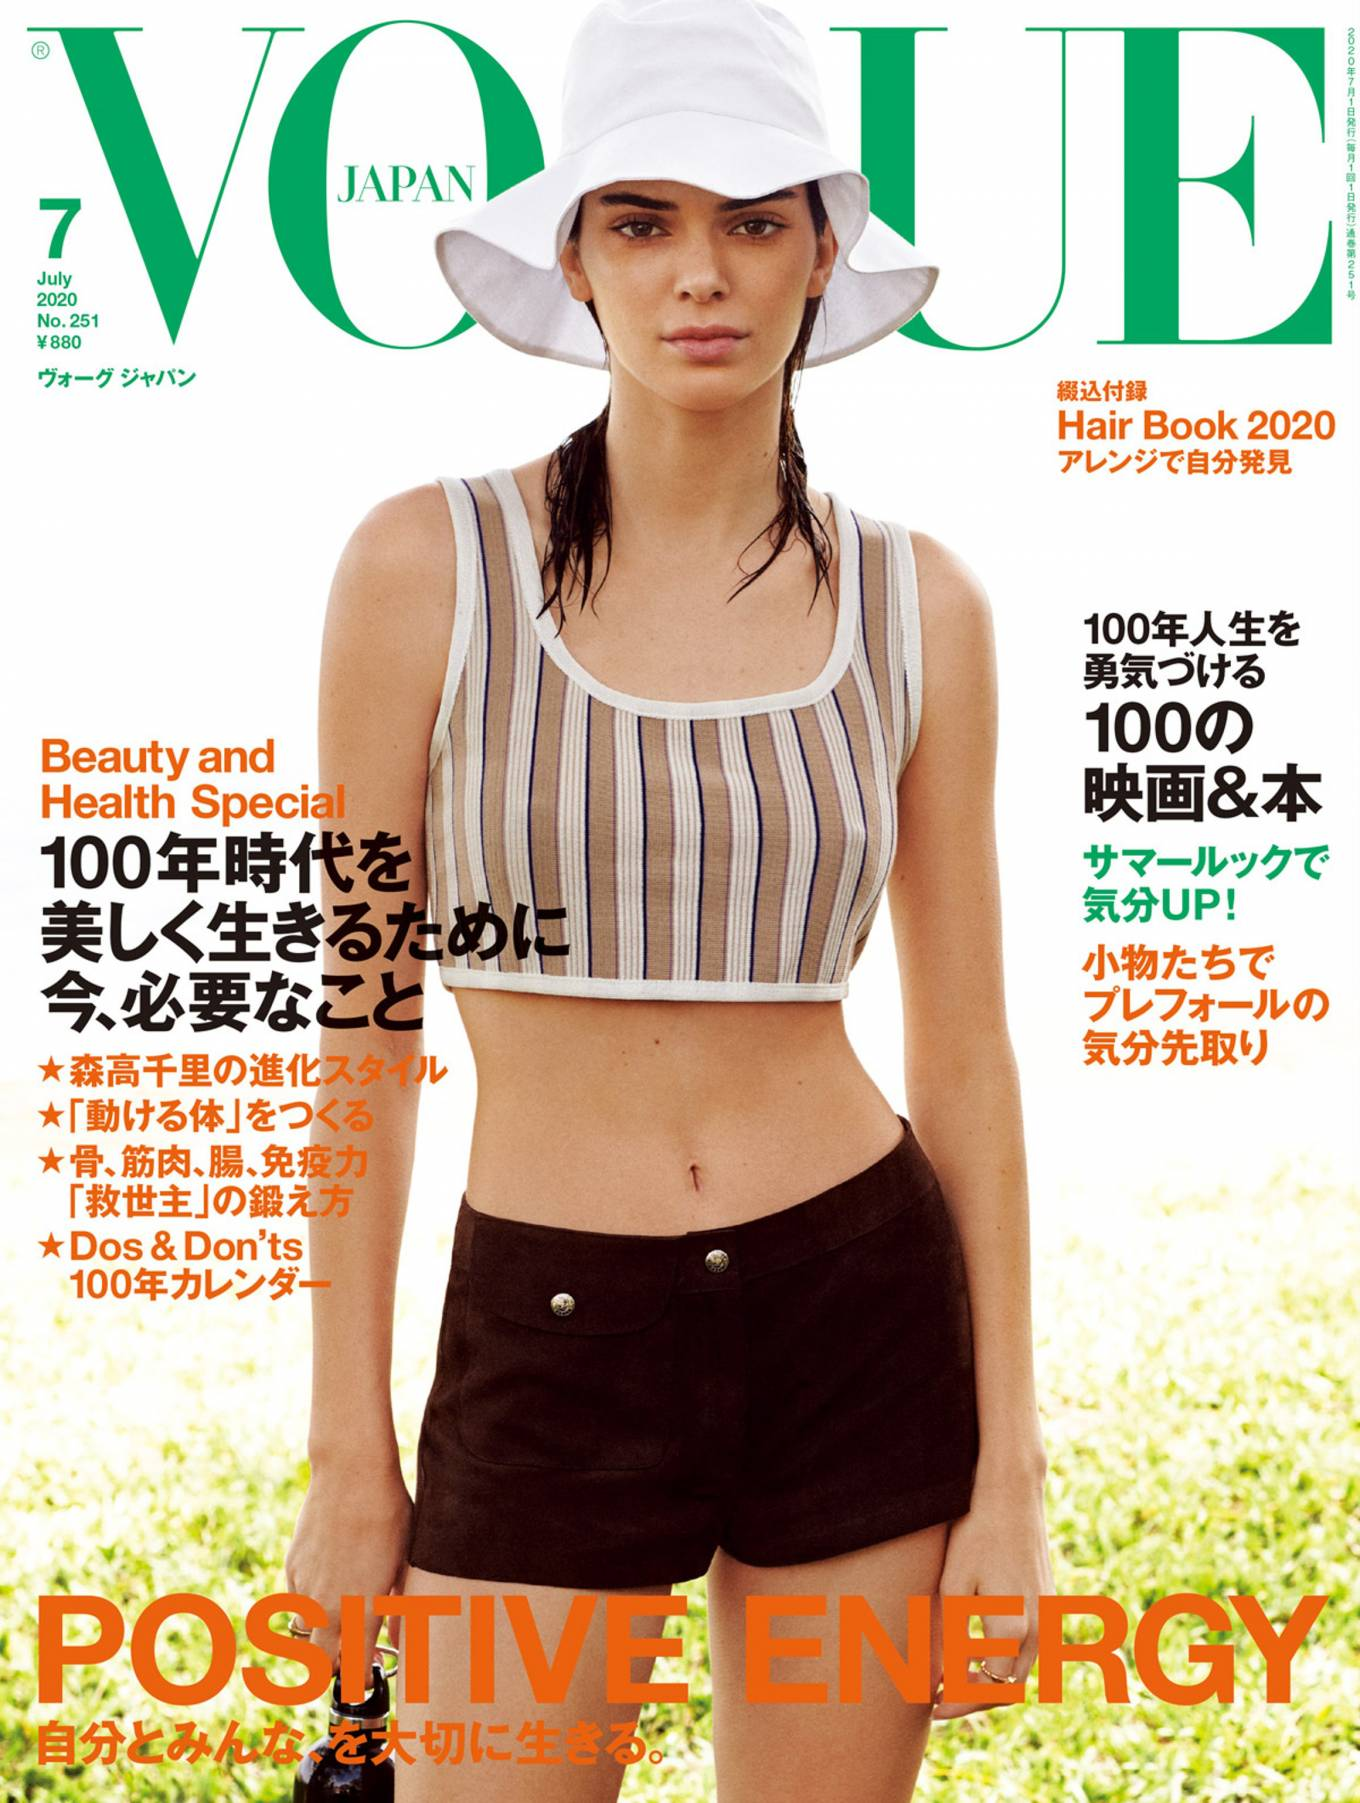 Kendall Jenner for Vogue Japan Cover (July 2020)